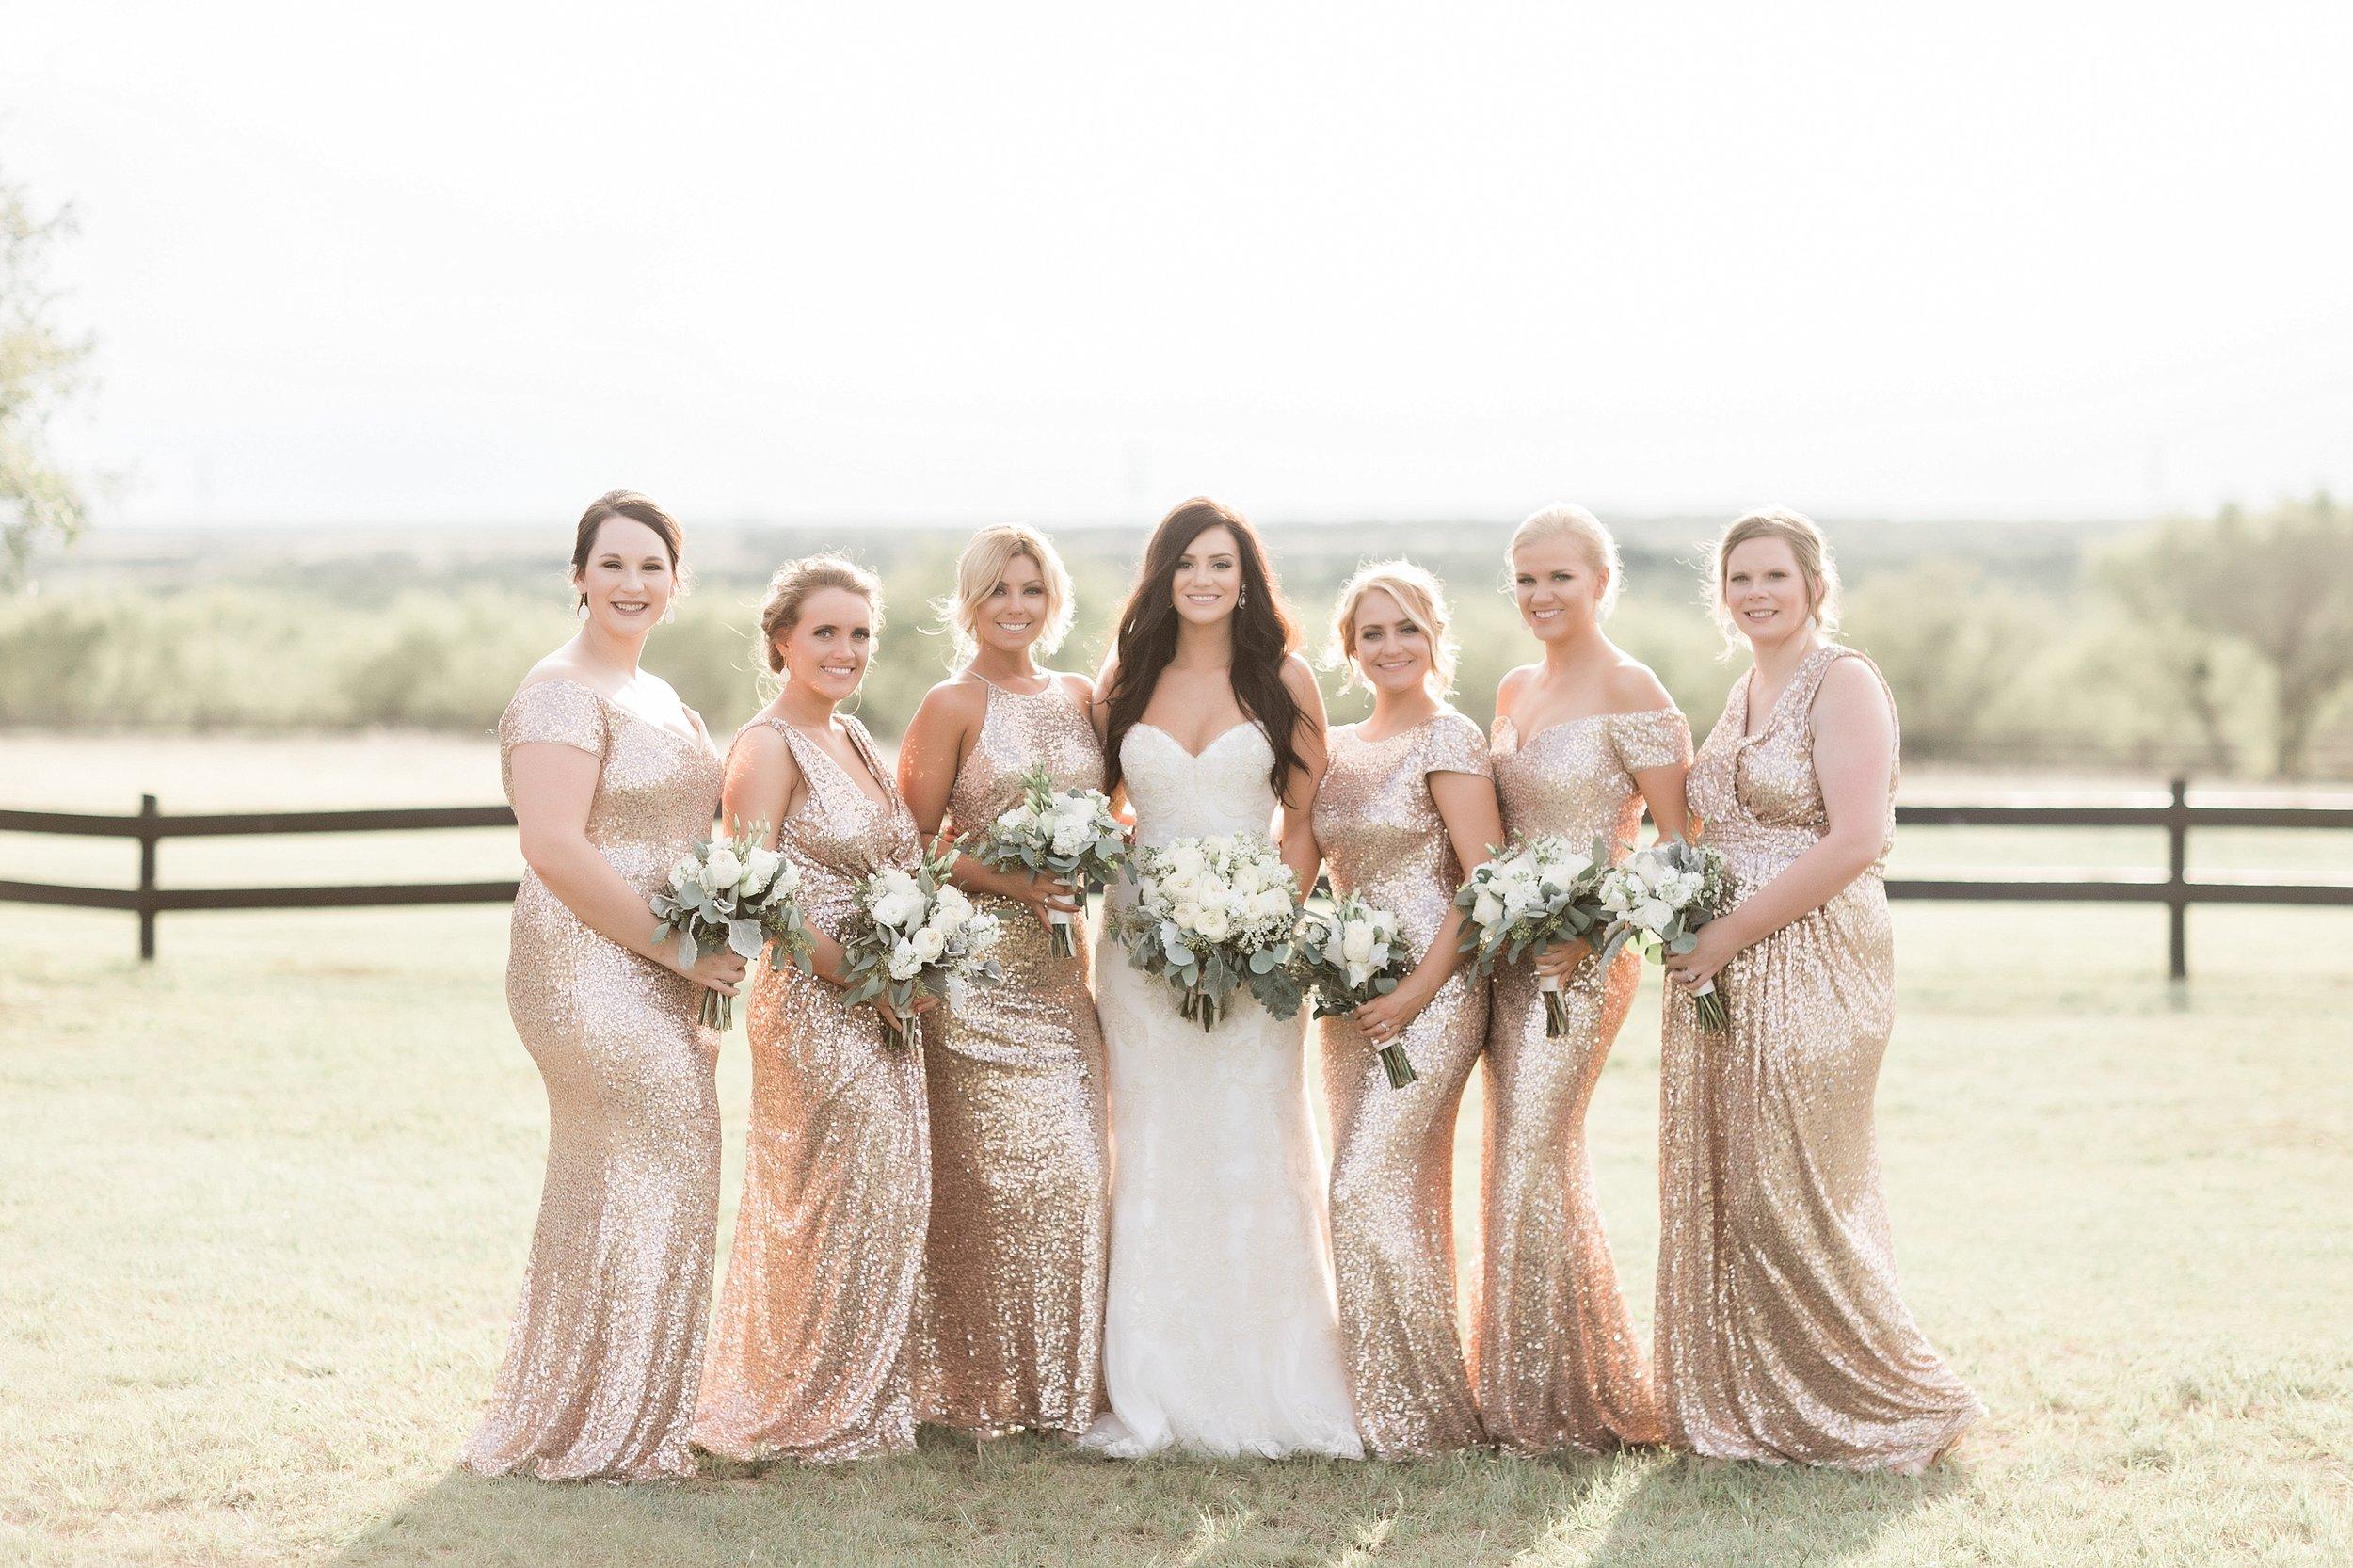 bailey-and-carl-coyote-ranch-resort-wedding-photographer-wichita-falls-texas-destination-wedding-0037.jpg